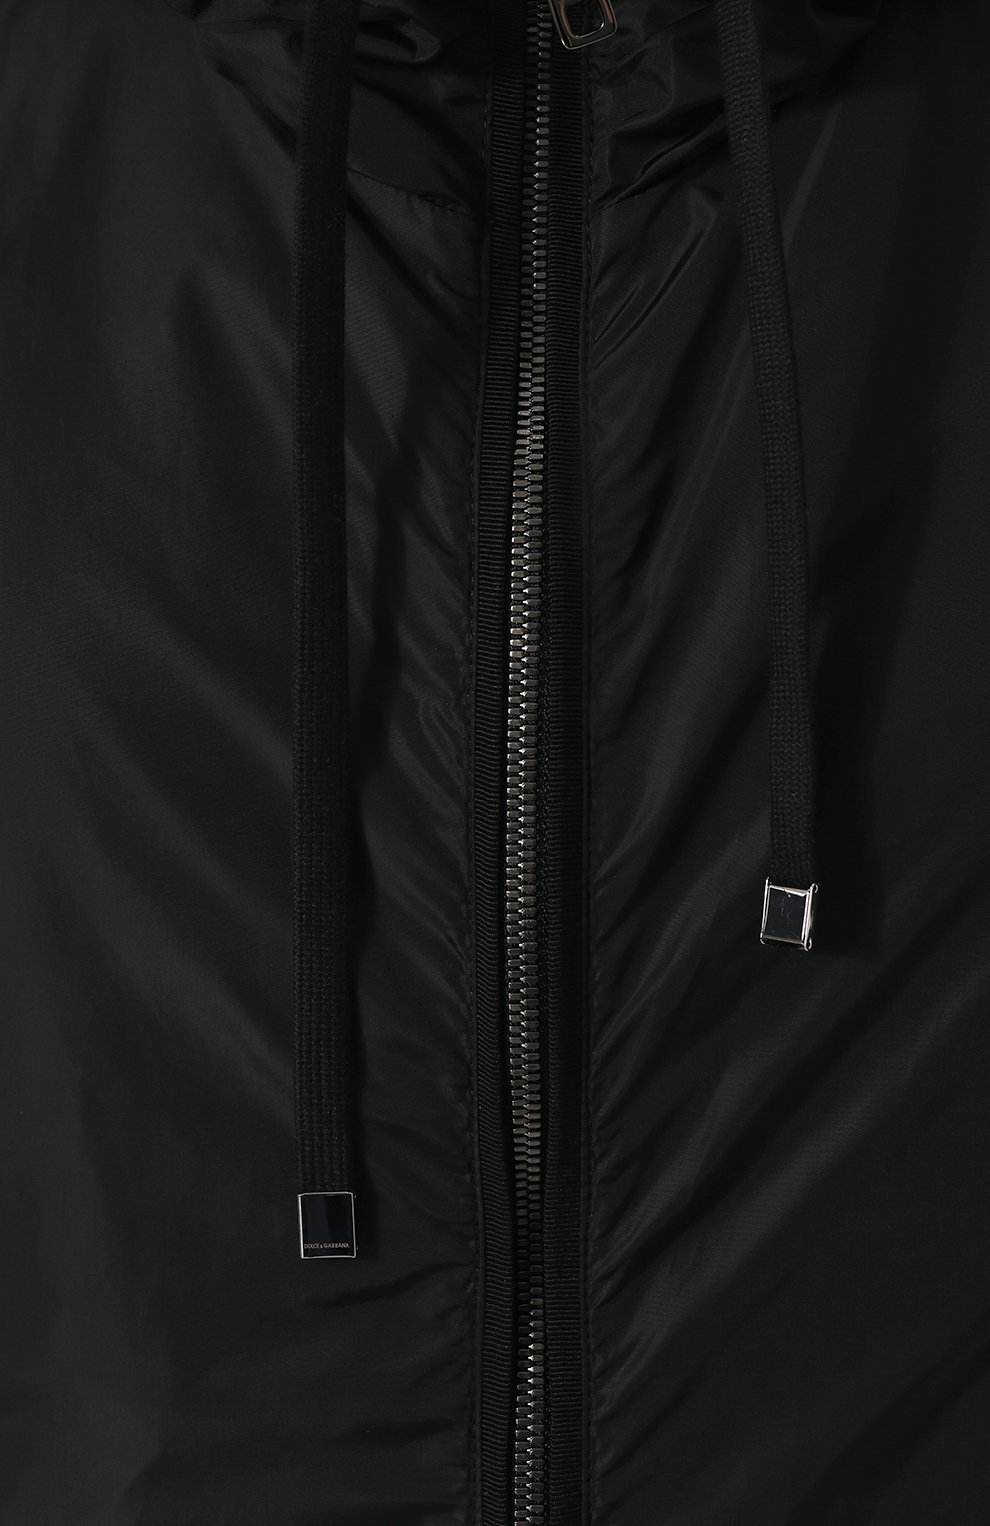 Мужской жилет на молнии с капюшоном DOLCE & GABBANA черного цвета, арт. G9KU0T/FUMQG   Фото 5